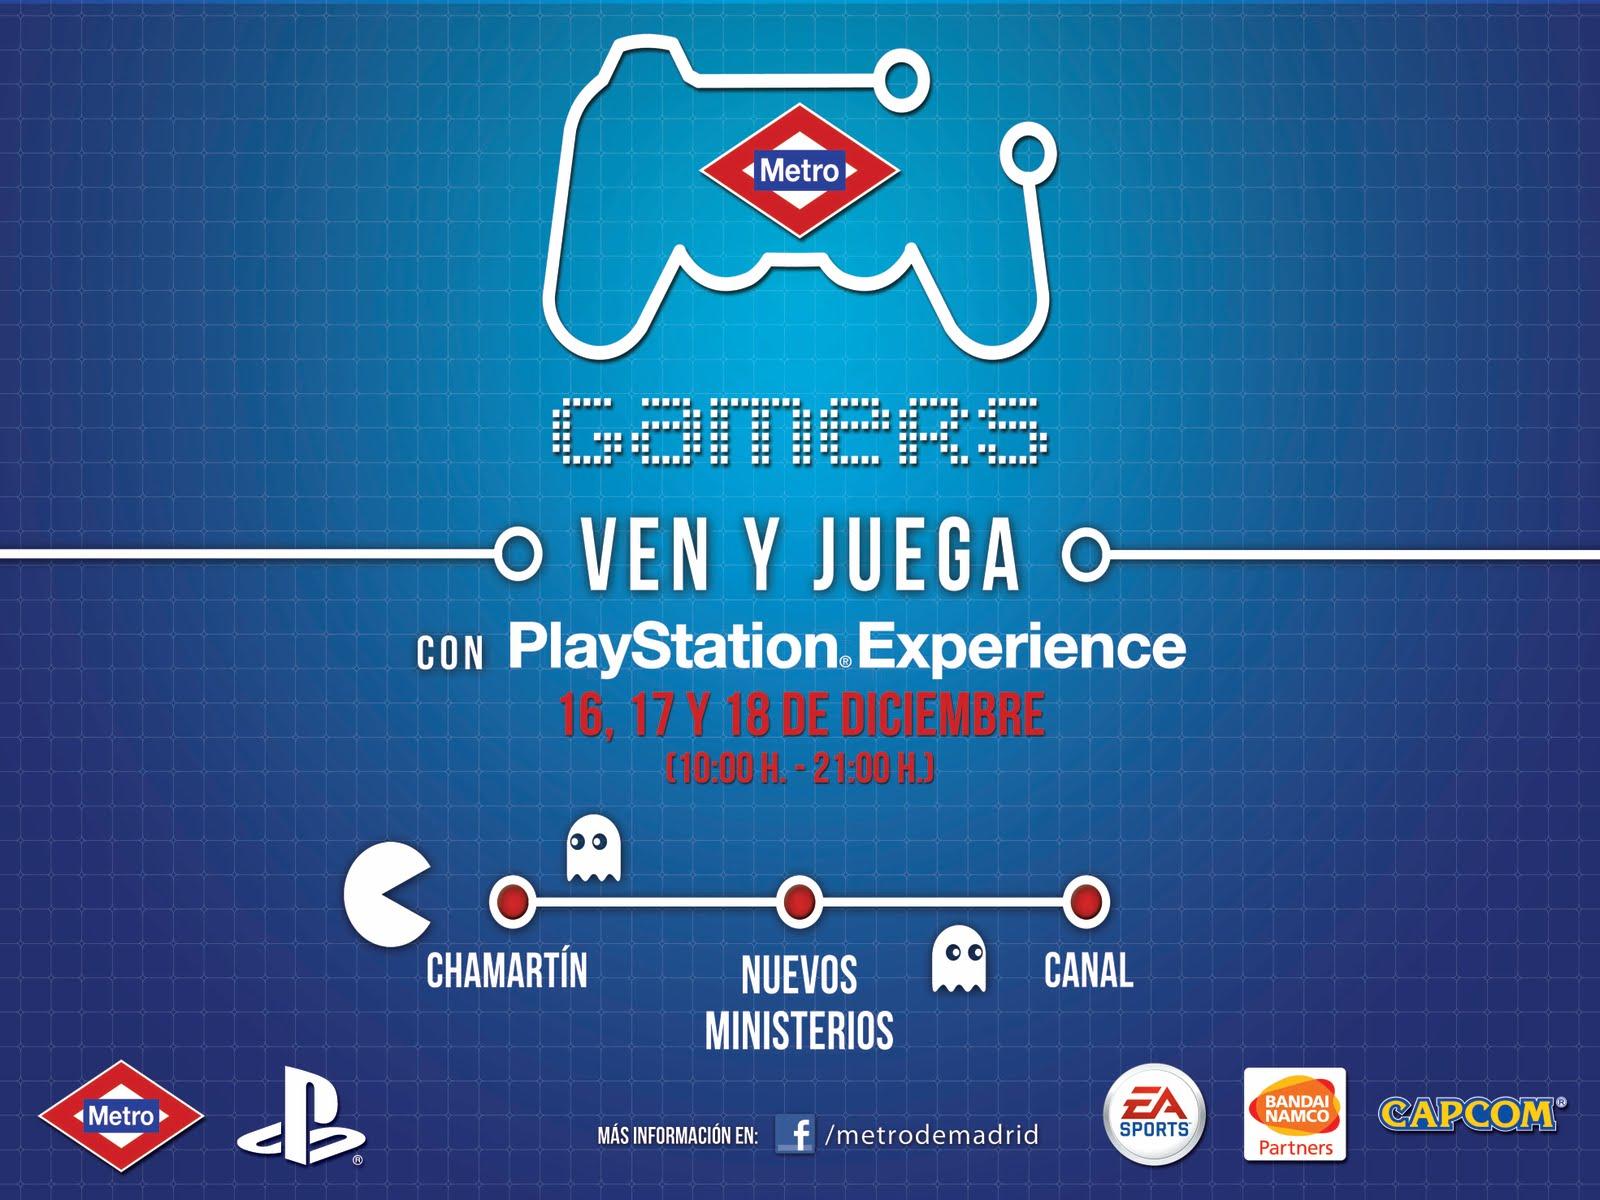 Metro Gamers Este Fin De Semana En Madrid Webvyc ~ Madrid Que Hacer Este Fin De Semana